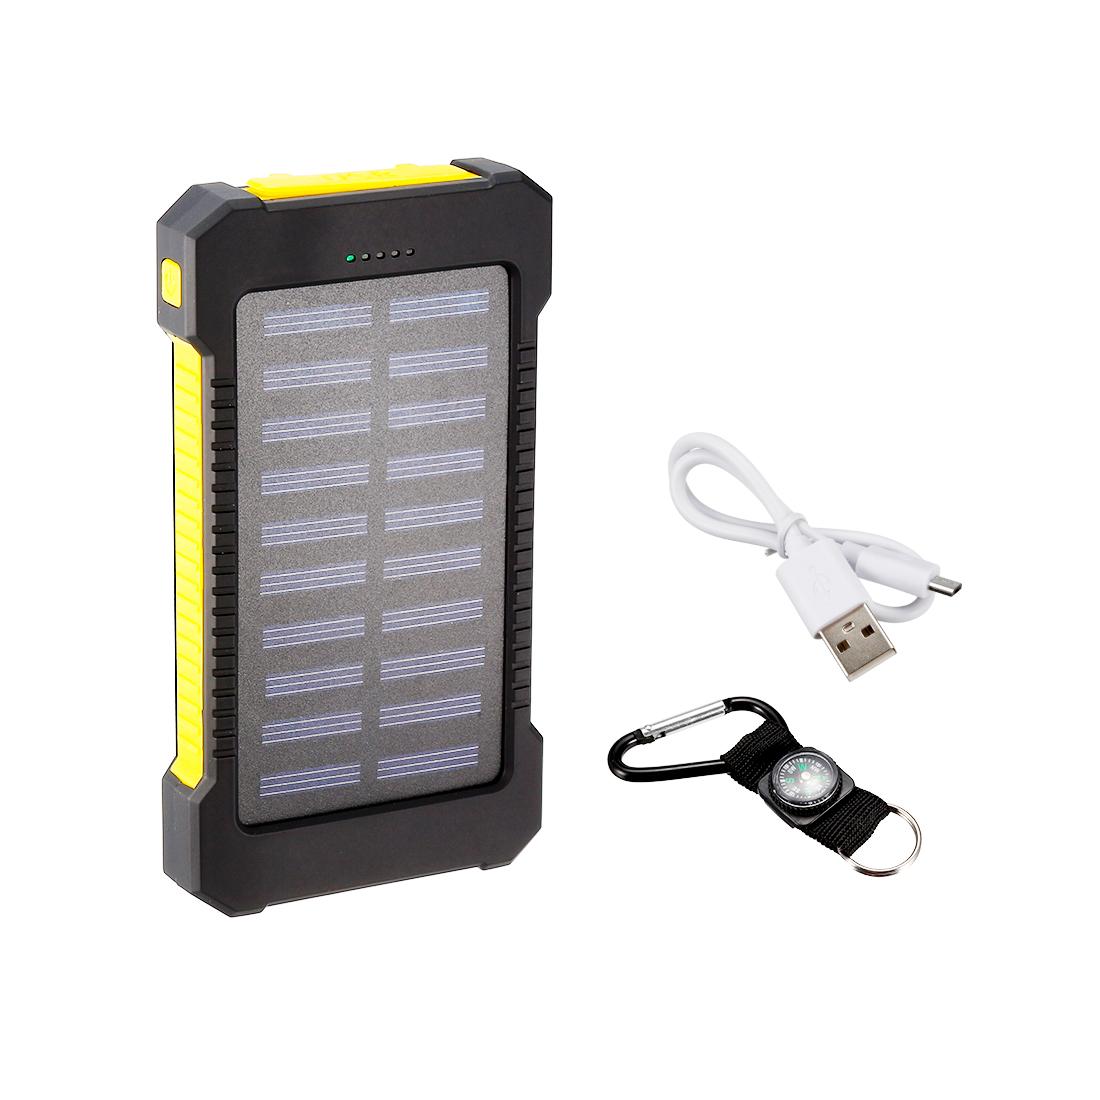 1.2W 8000mAh Solar Charger Dual USB Power Bank Battery Flashlight Yellow